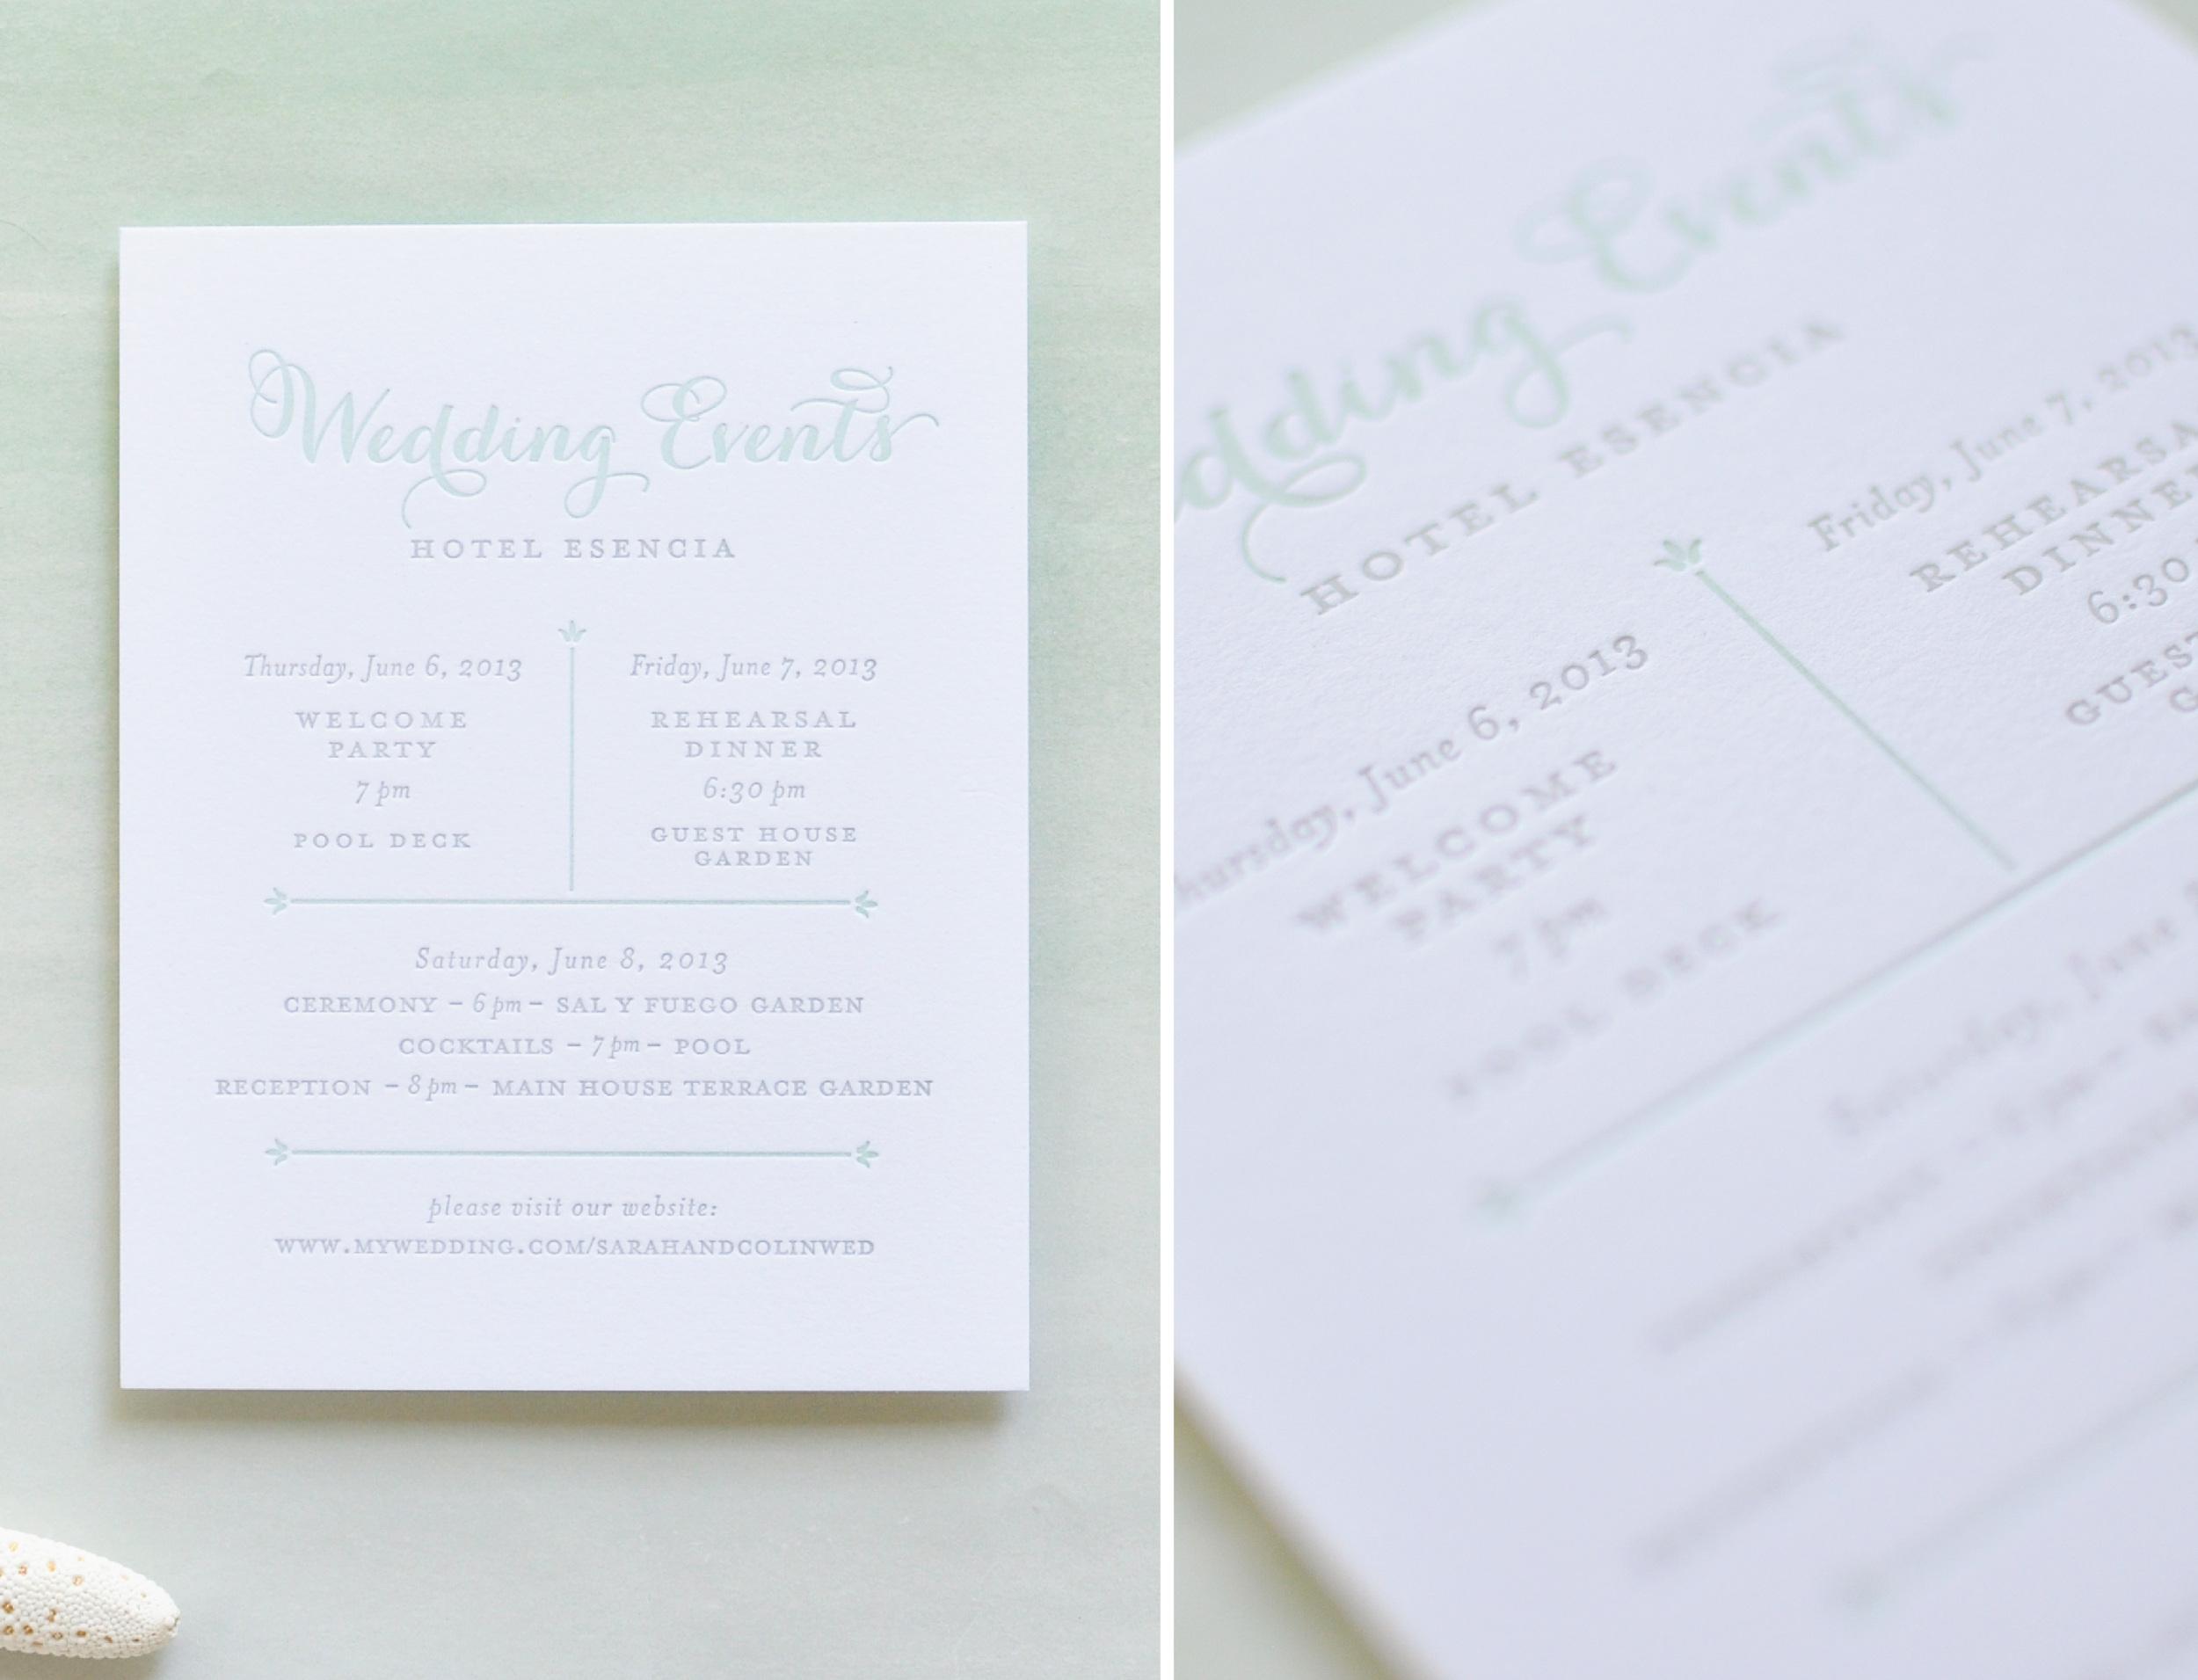 Alys_Elegant Beach Wedding Invitation_3-01.jpg